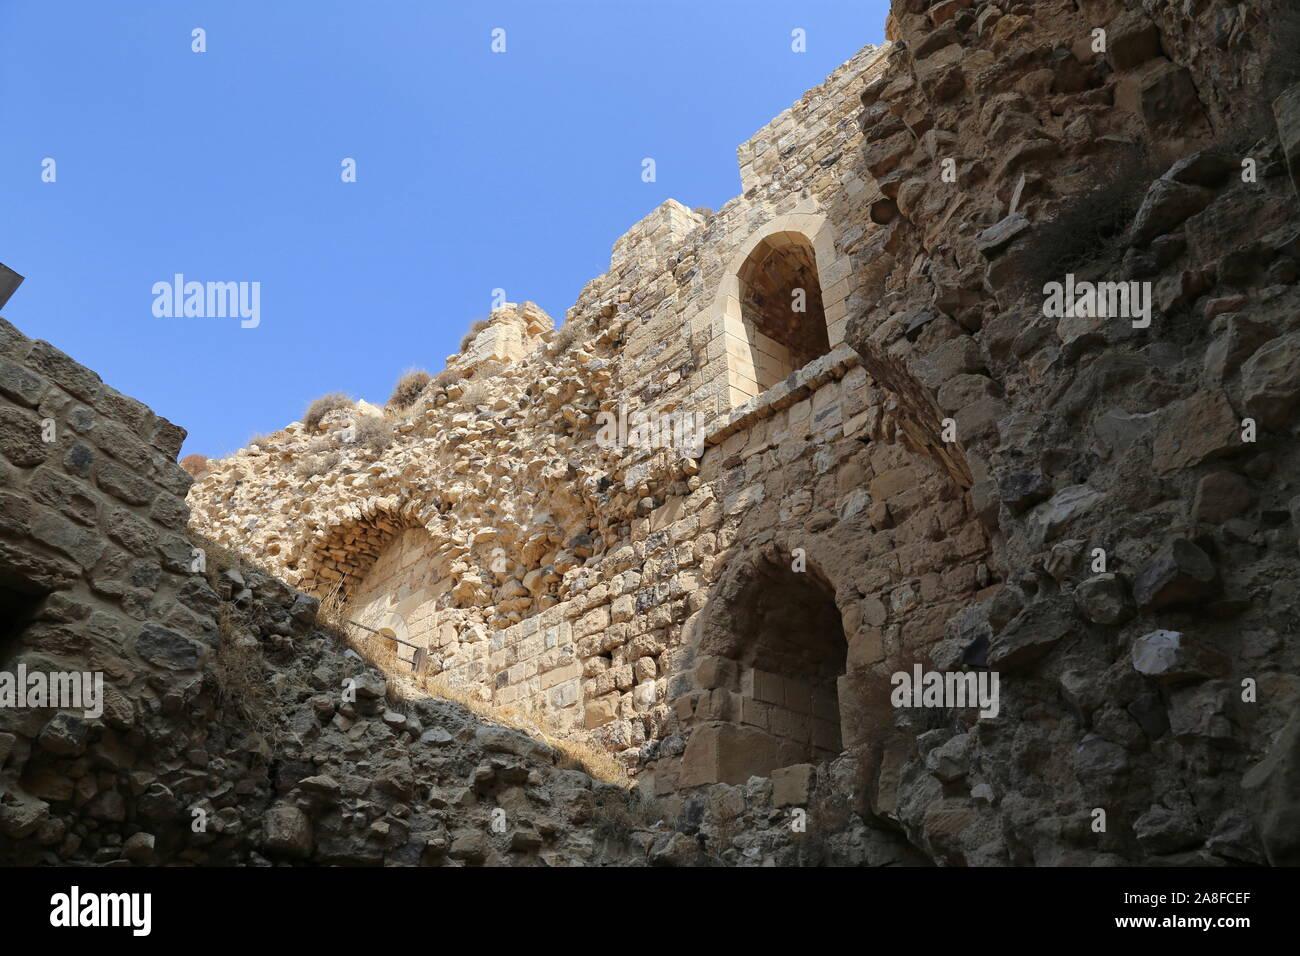 North East Tower, Karak Castle, Al Karak, Karak Governorate, Jordan, Middle East Stock Photo